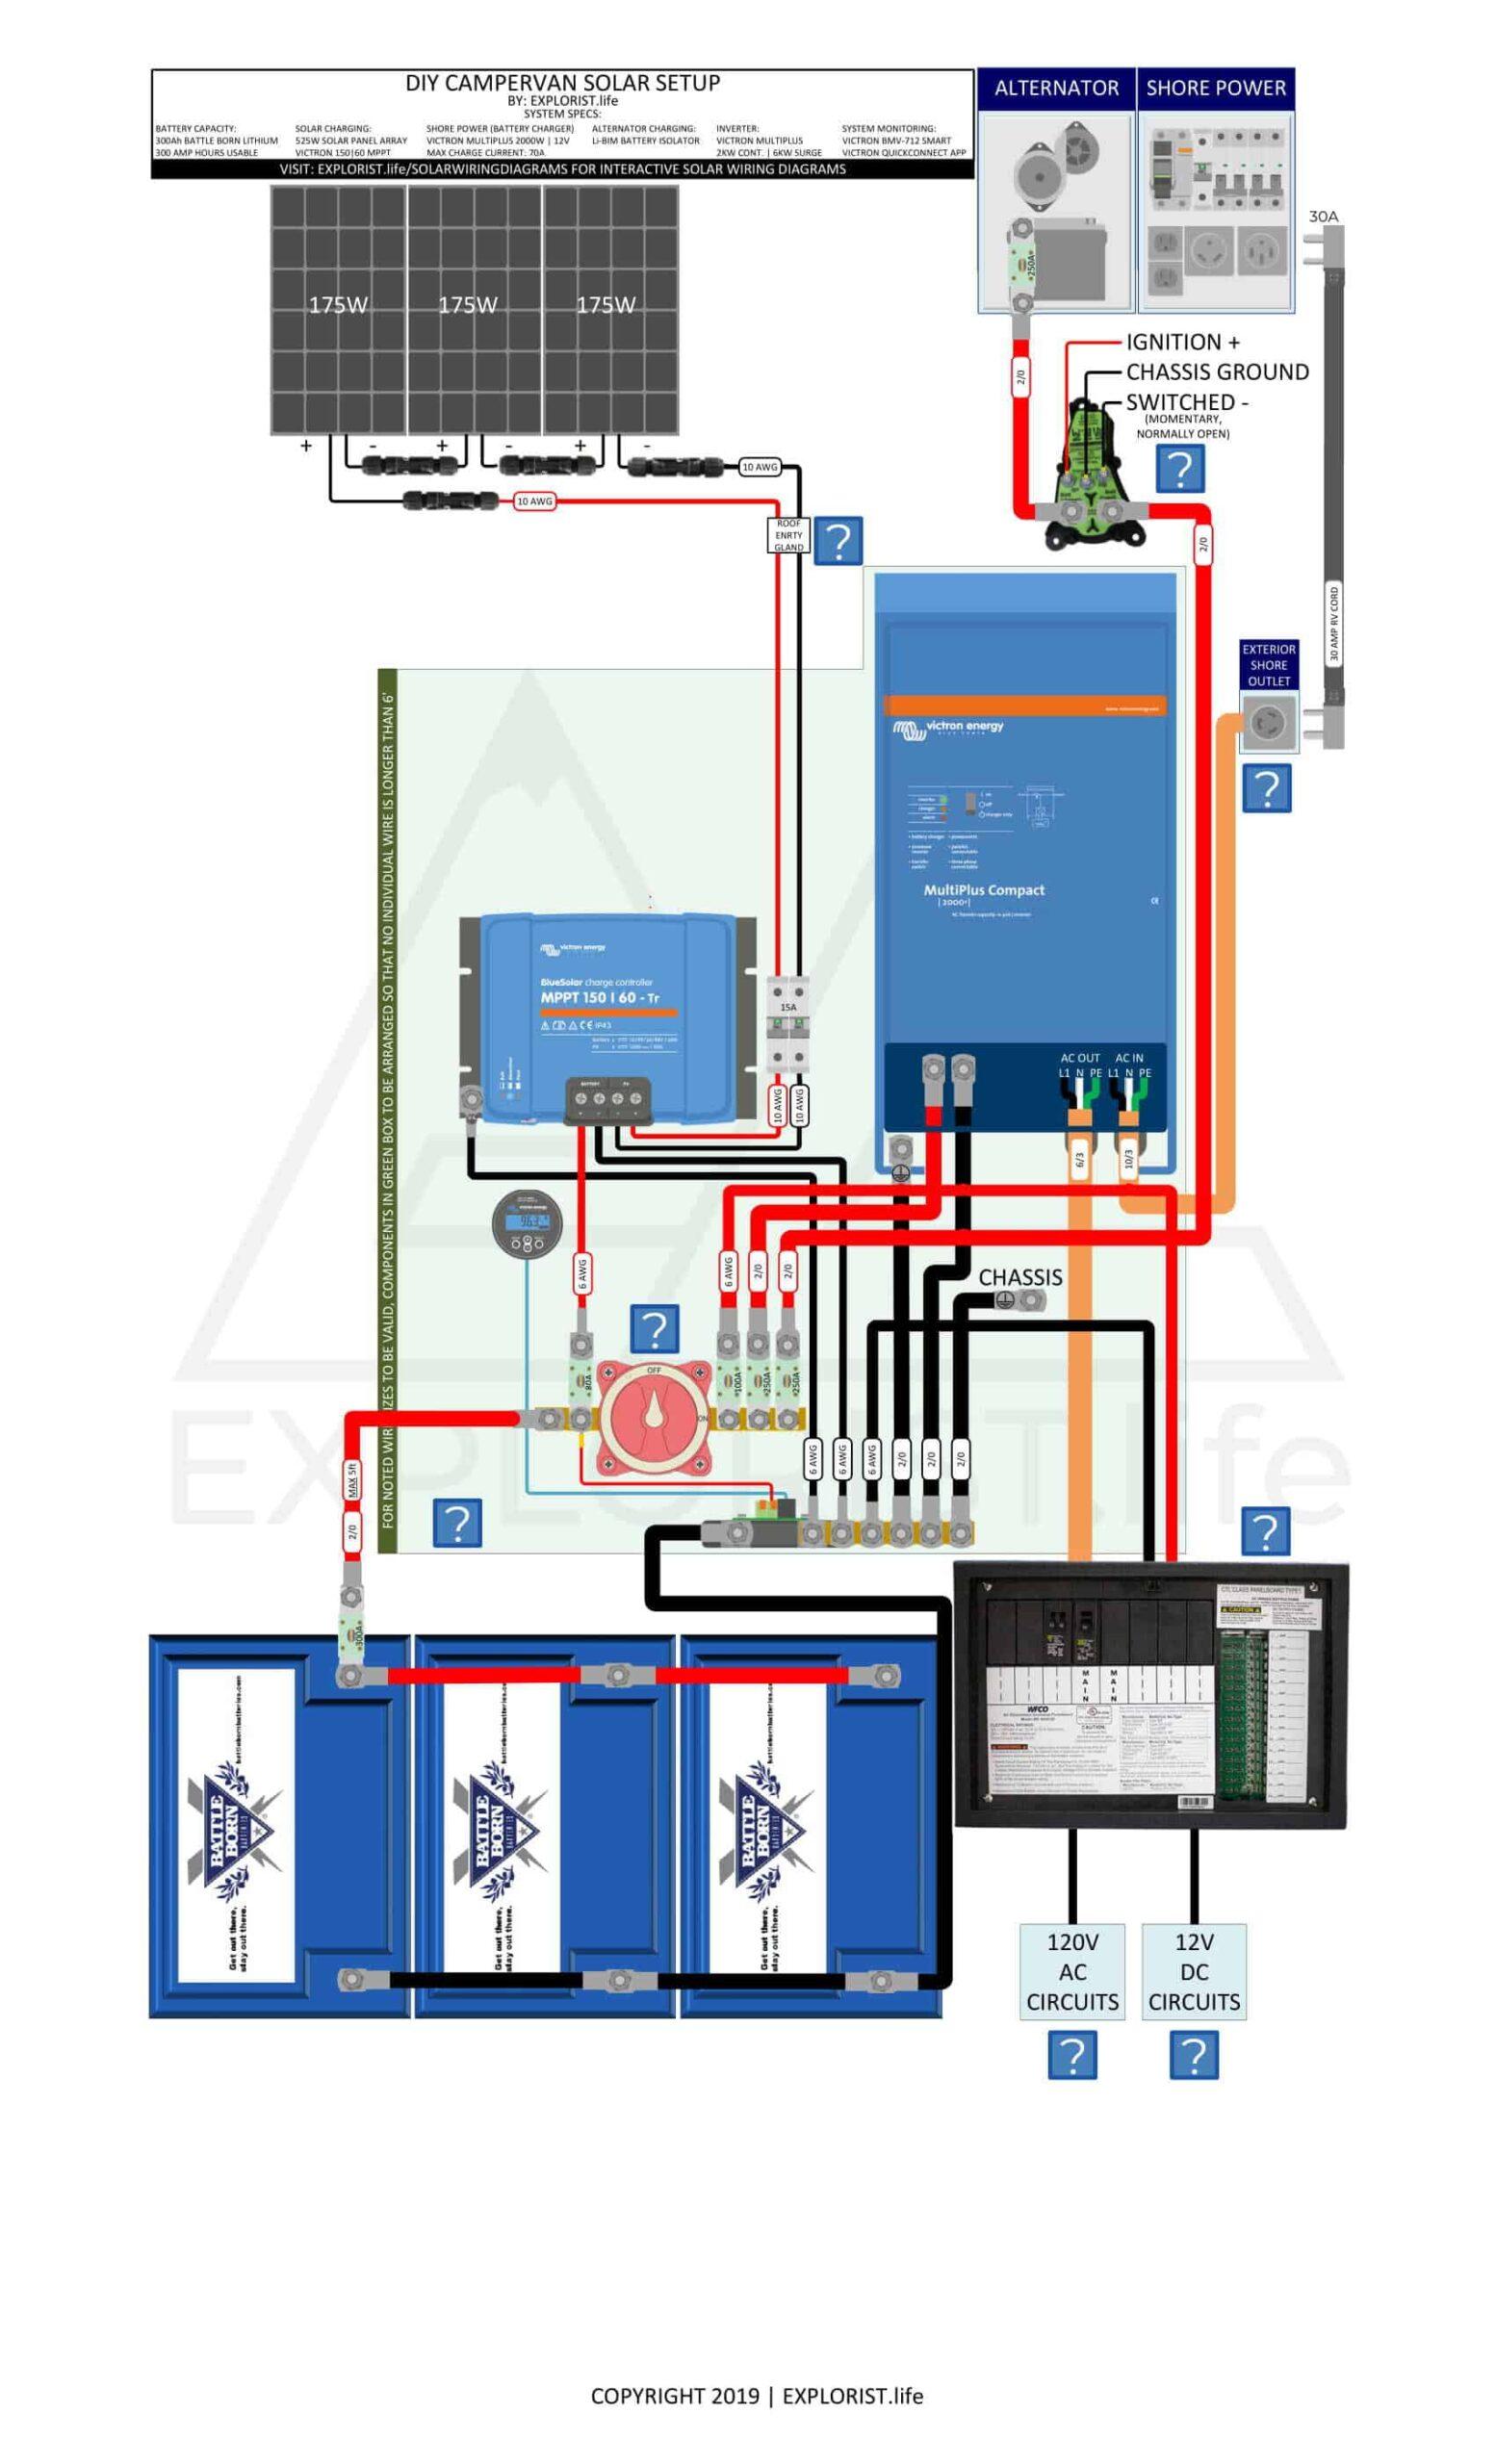 300Ah Lithium Battery Bank – 3x175W Solar – 2kW Inverter/Charger – Li-BIM Alternator Charging